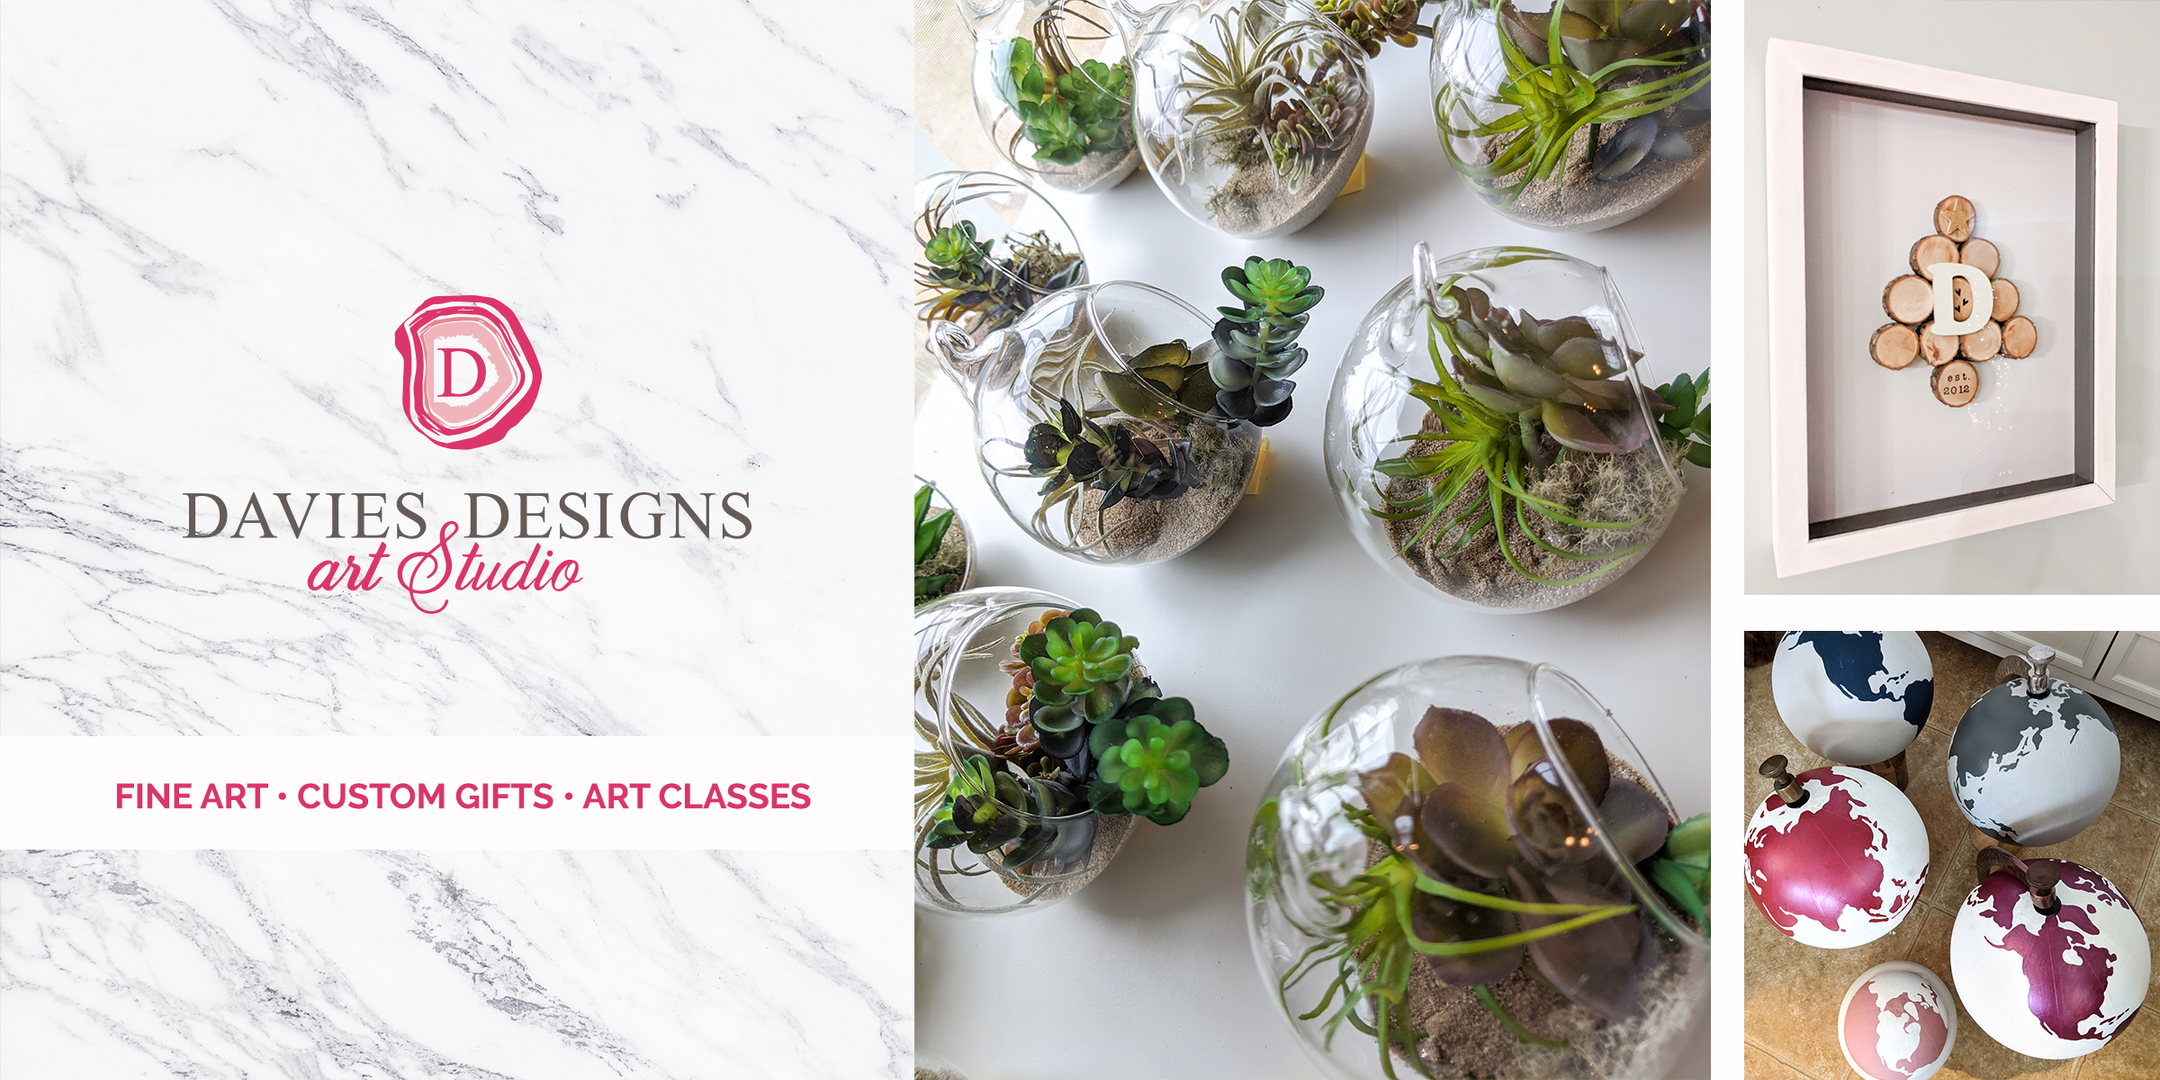 Davies Designs Art Studio